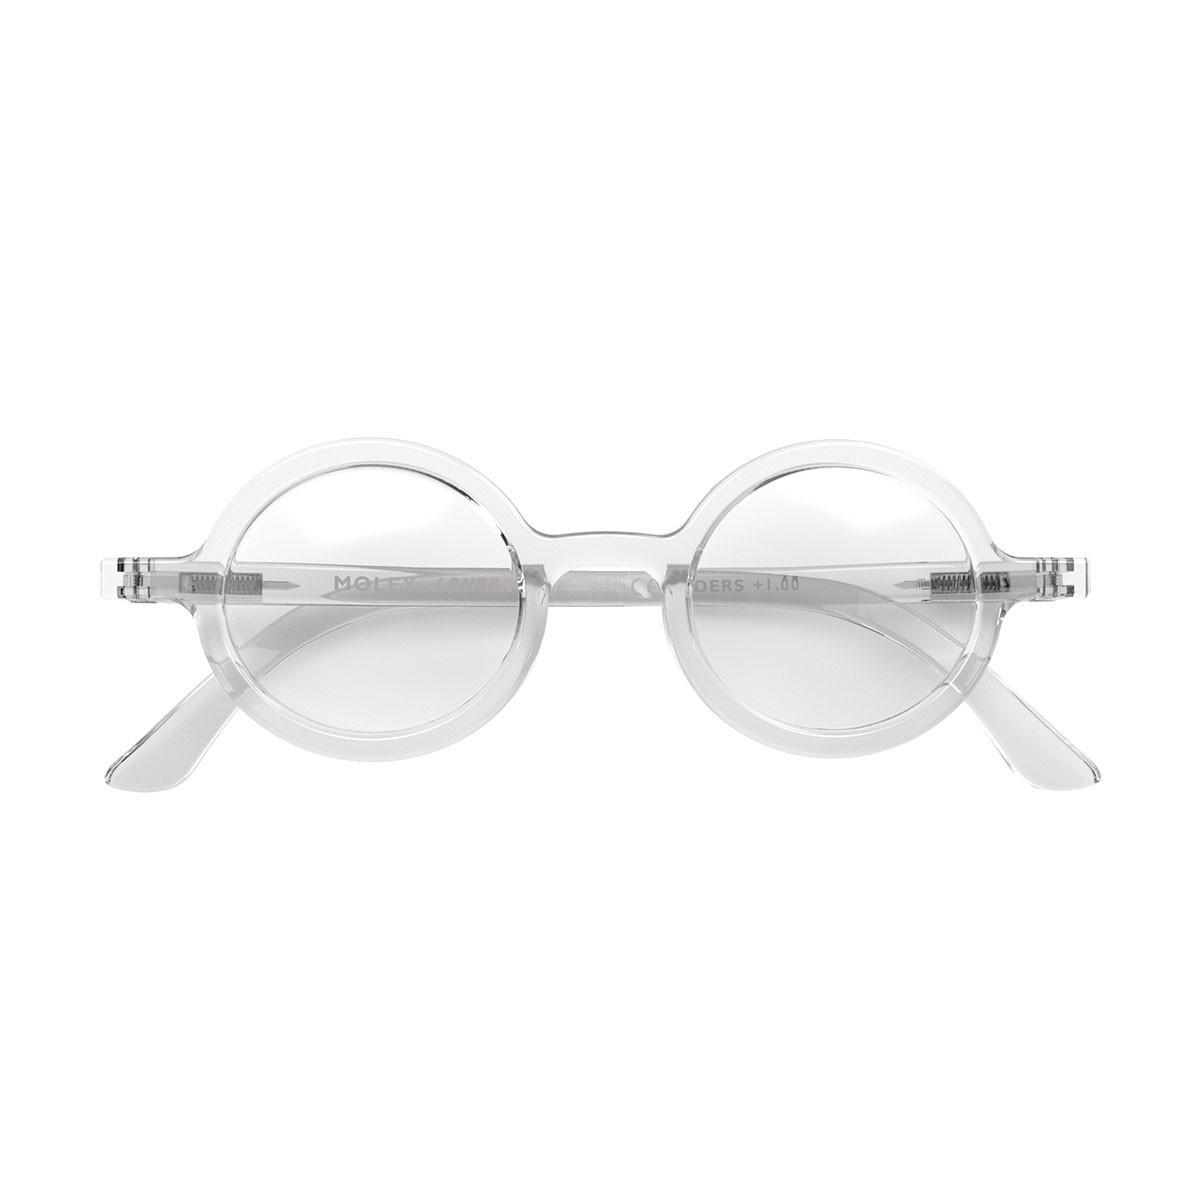 London Mole Moley Blue Blocker Glasses Transparent